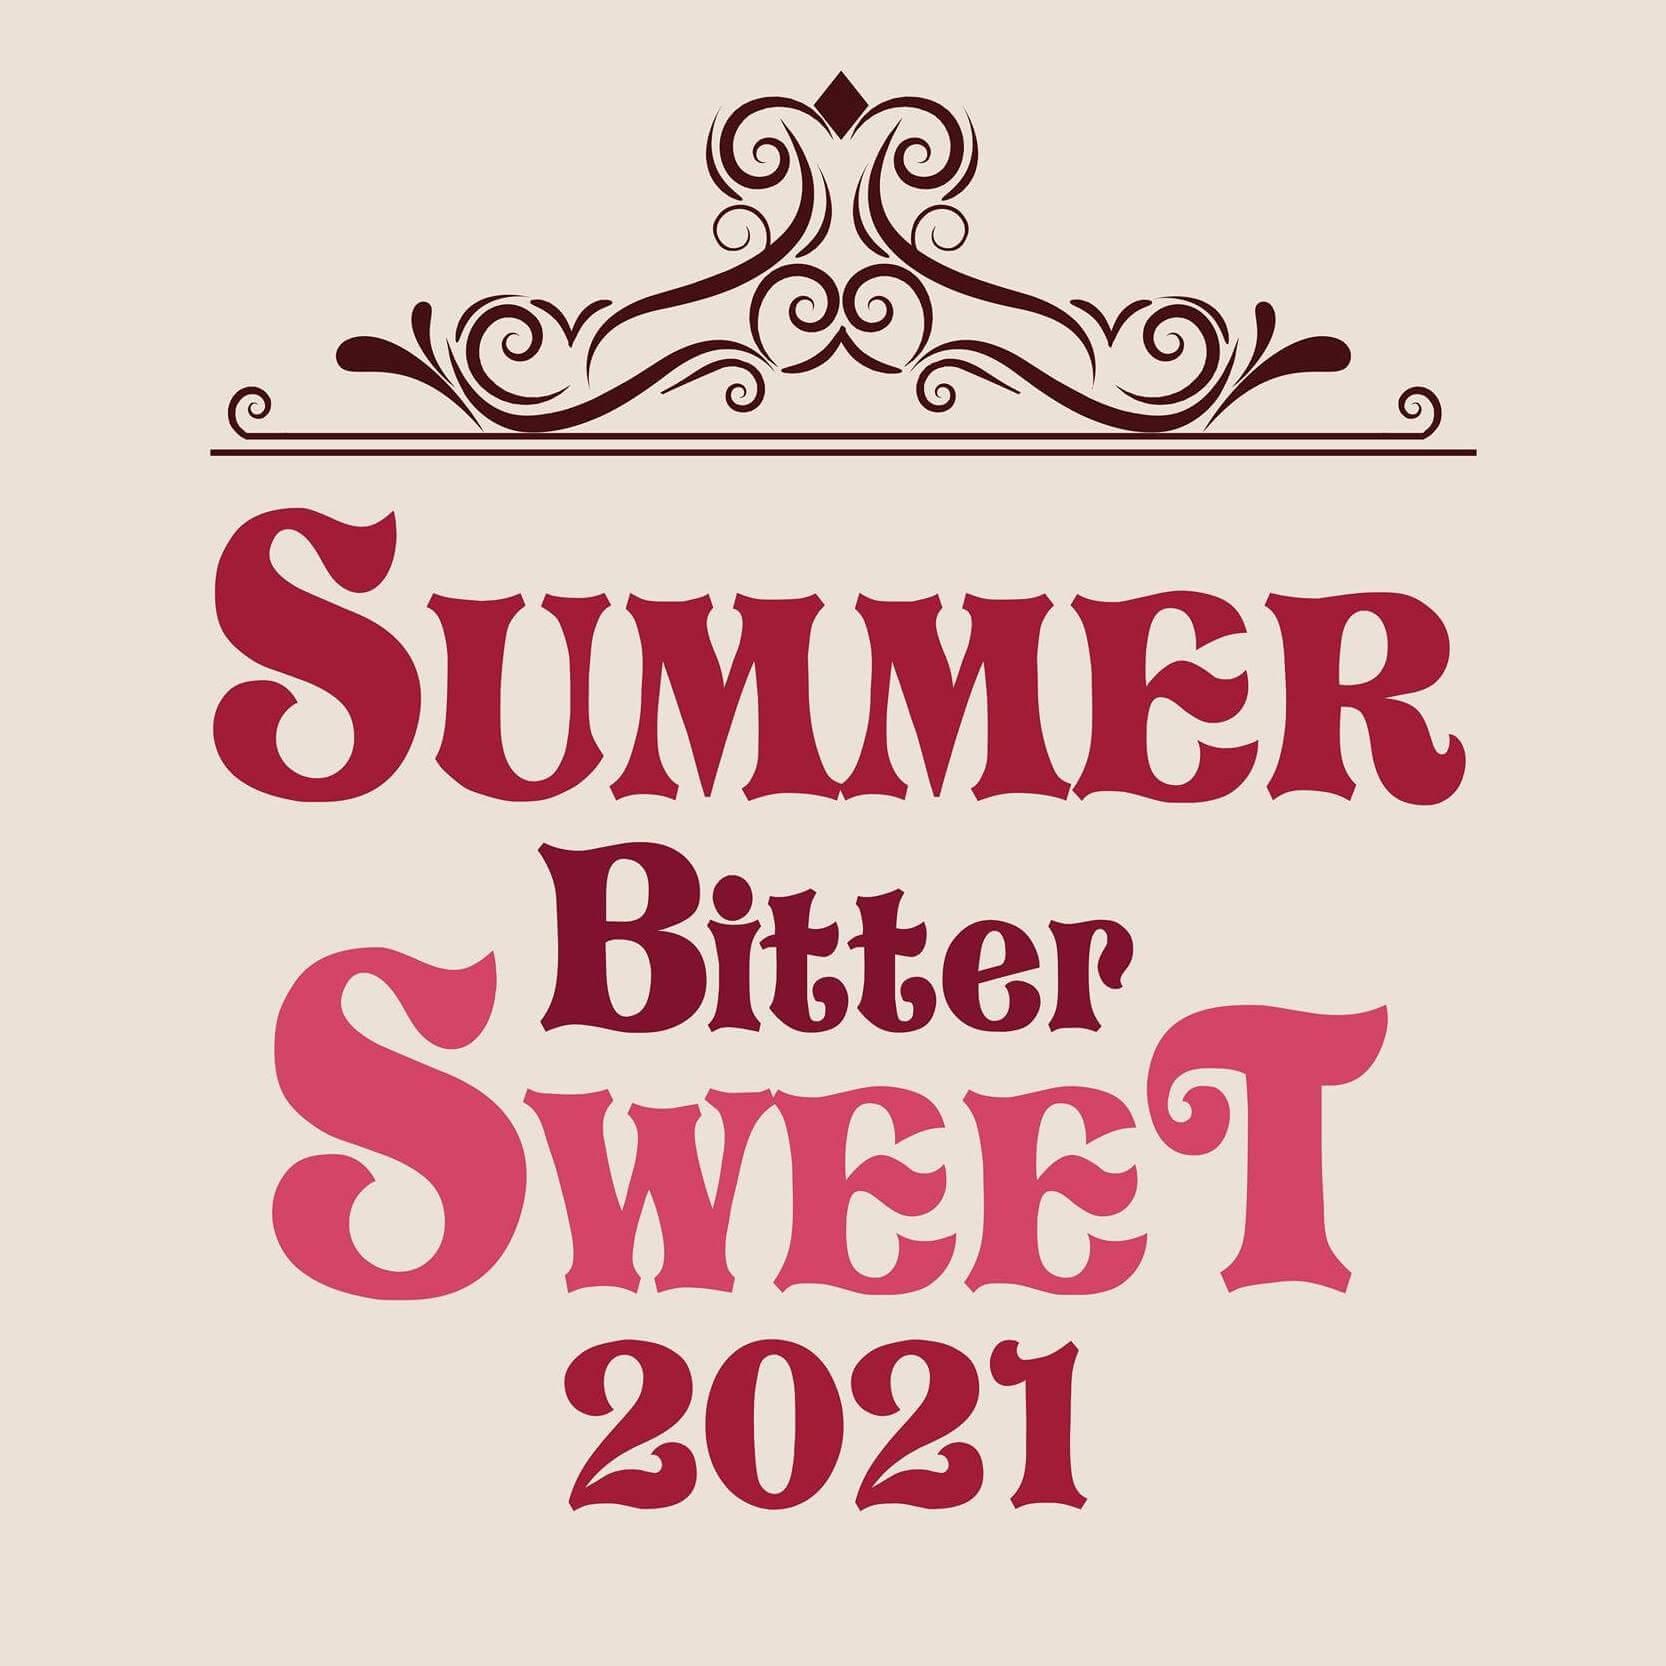 Summer Bitter Sweet 2021 ICC HATYAI ศูนย์ประชุมนานาชาติฉลองสิริราชสมบัติครบ ๖๐ ปี